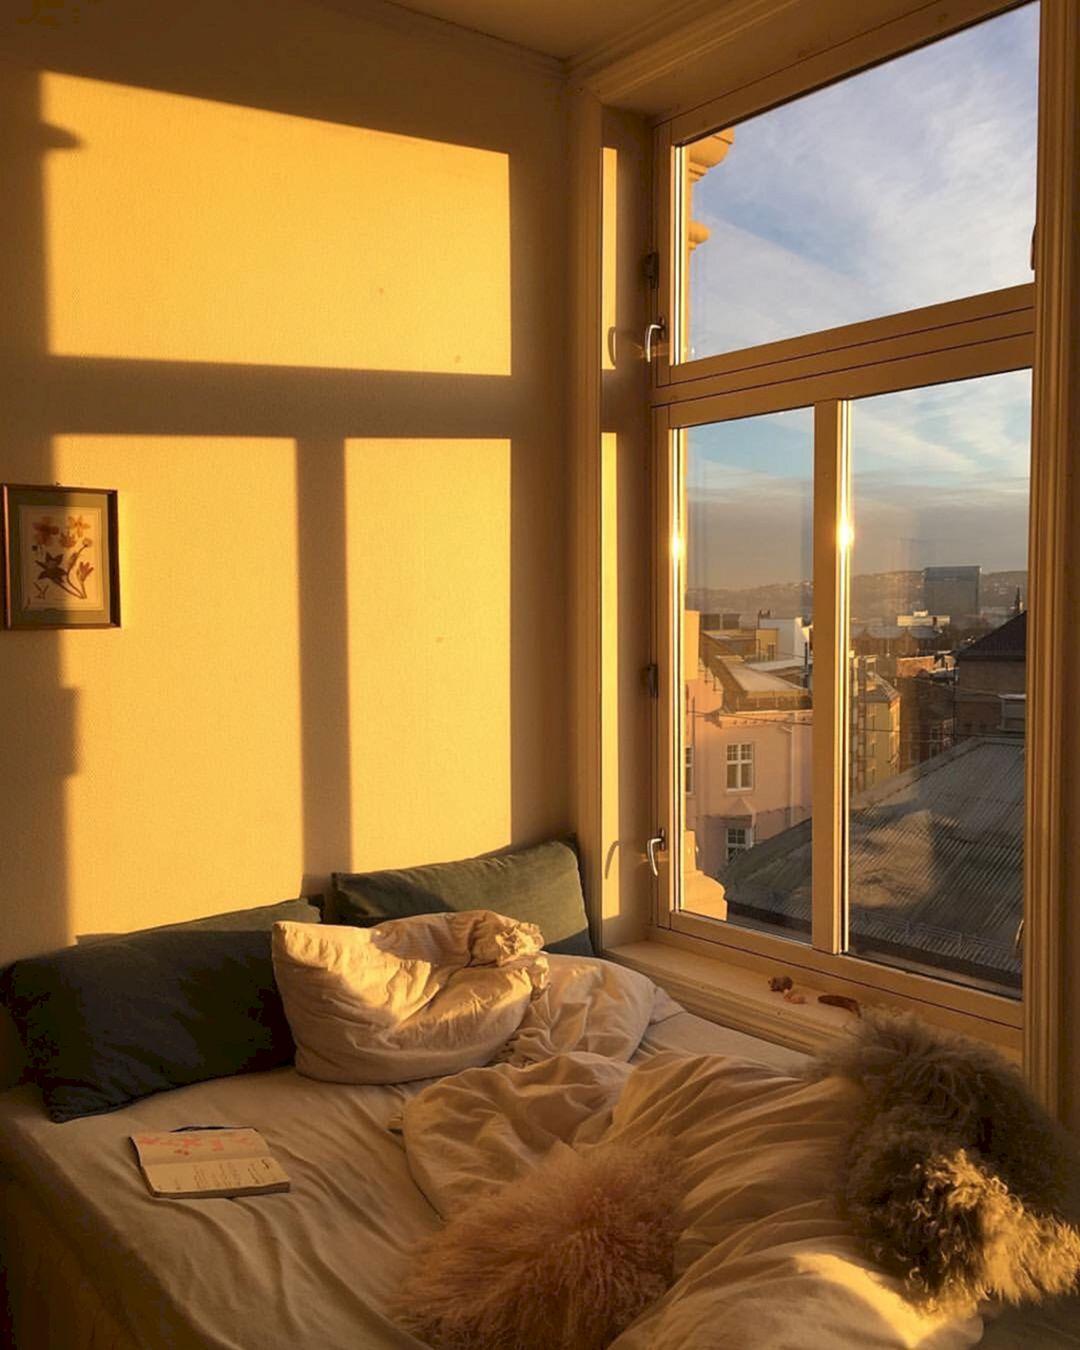 Aesthetic Bedroom: Incredible Yellow Aesthetic Bedroom Decorating Ideas 38